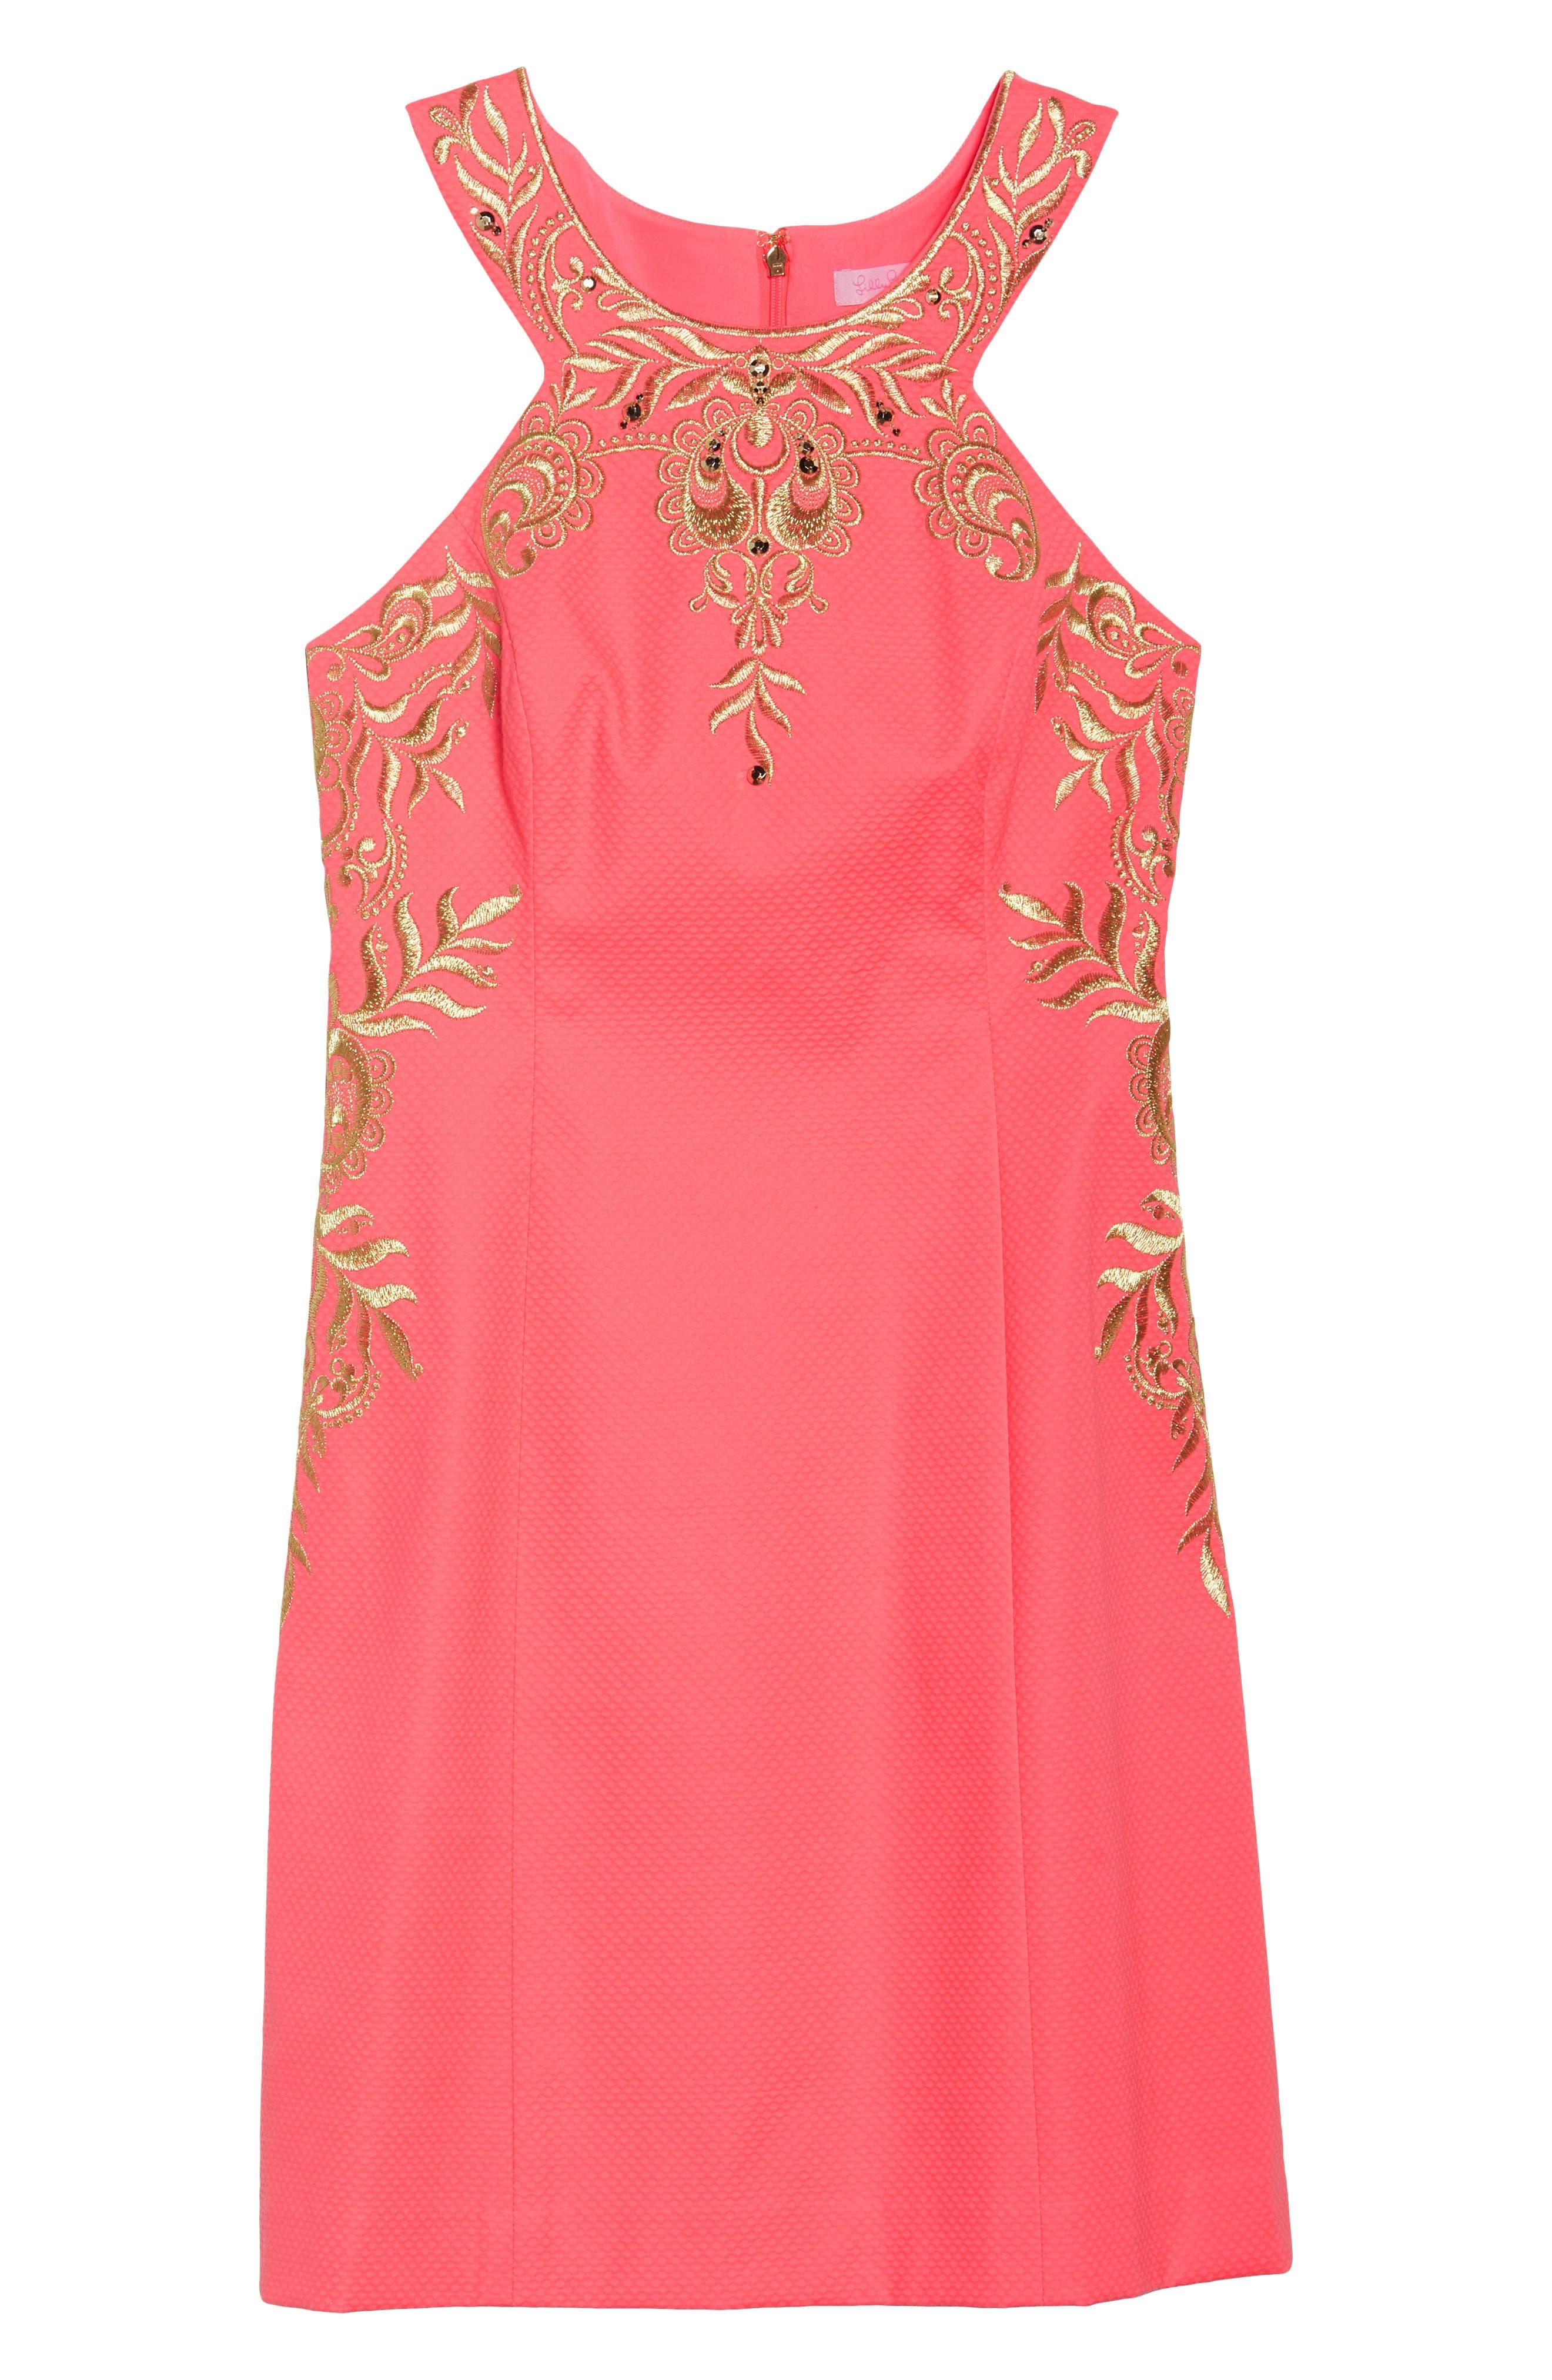 Tina Embroidered Sheath Dress,                             Alternate thumbnail 6, color,                             Coral Suns